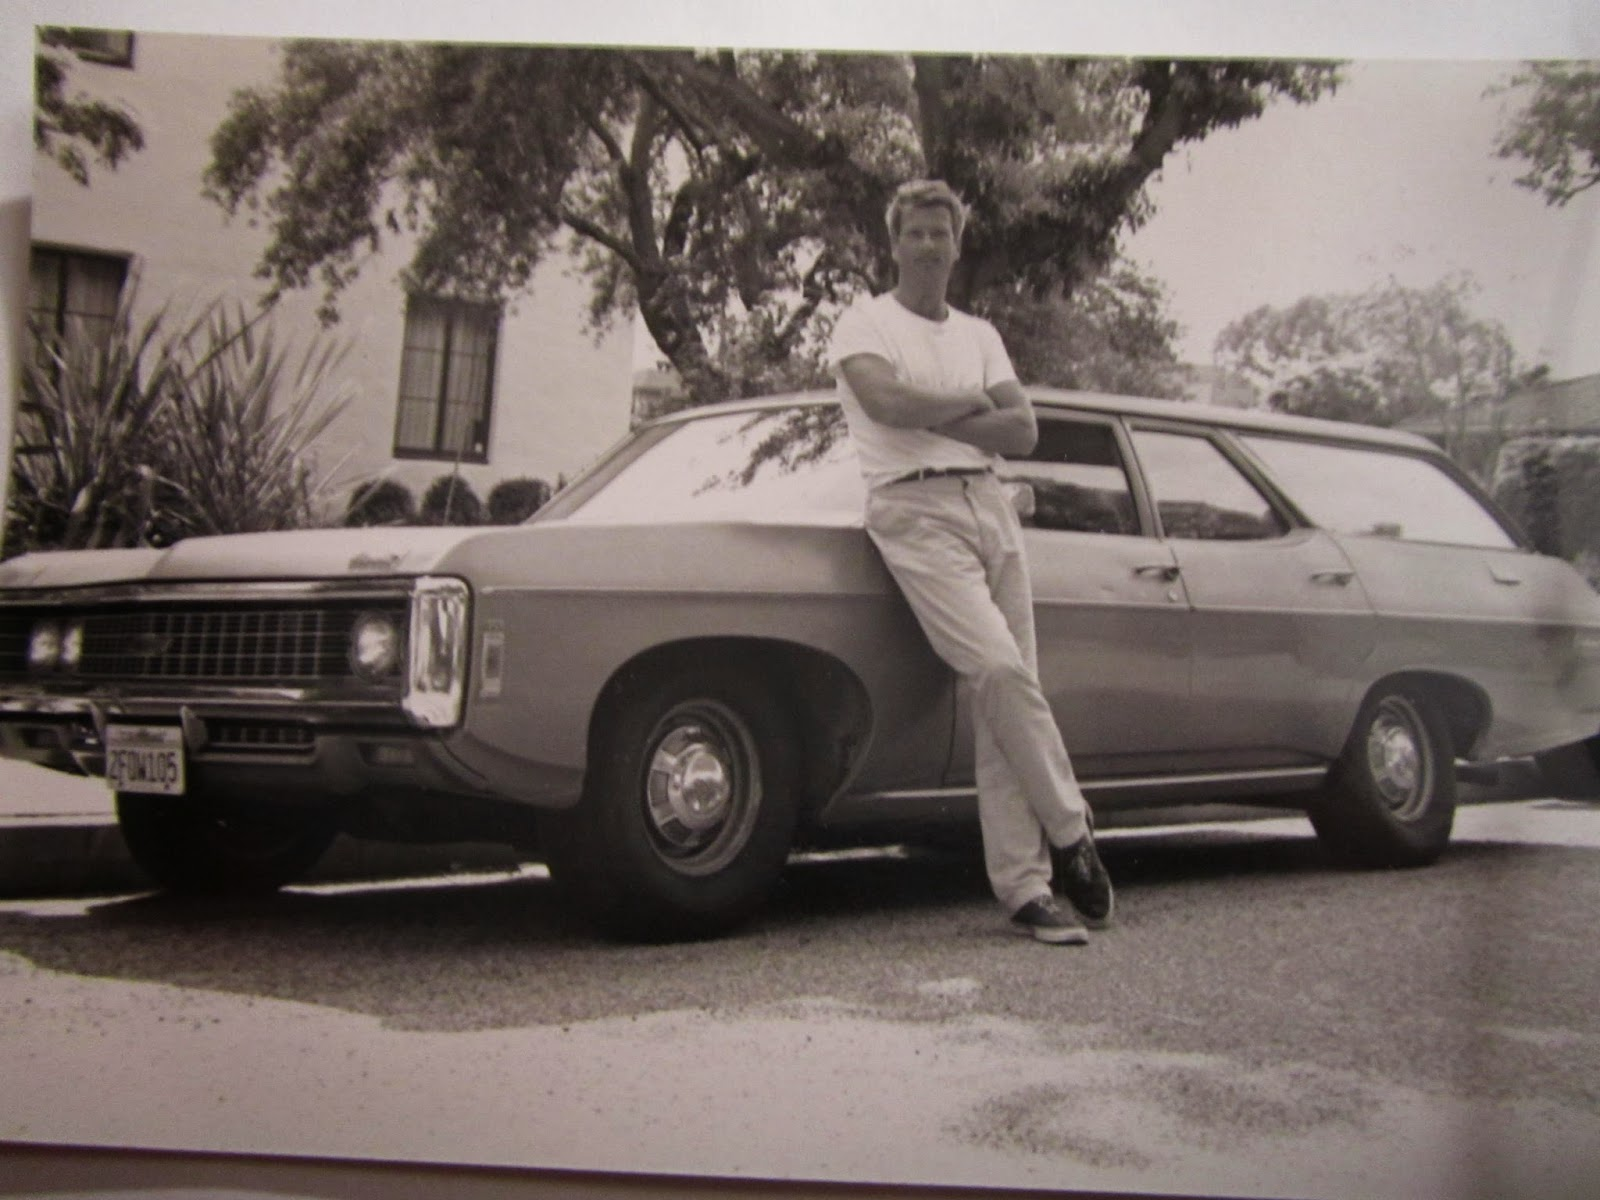 1969 Chevrolet Brookwood, Santa Barbara